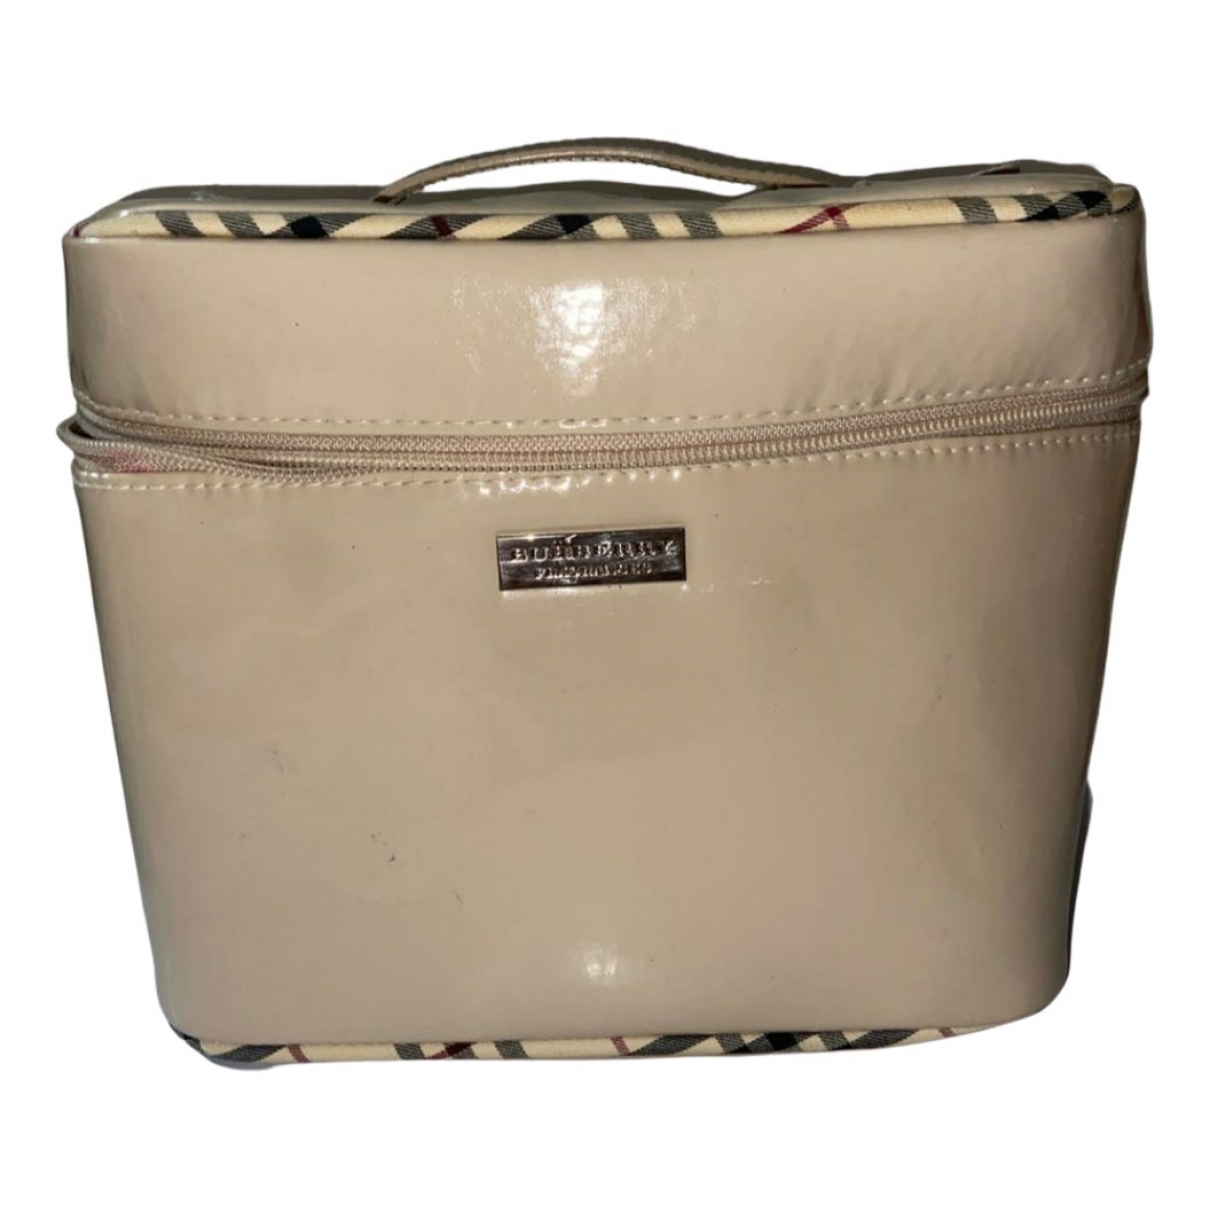 Burberry N Ecru Travel bag for Women N